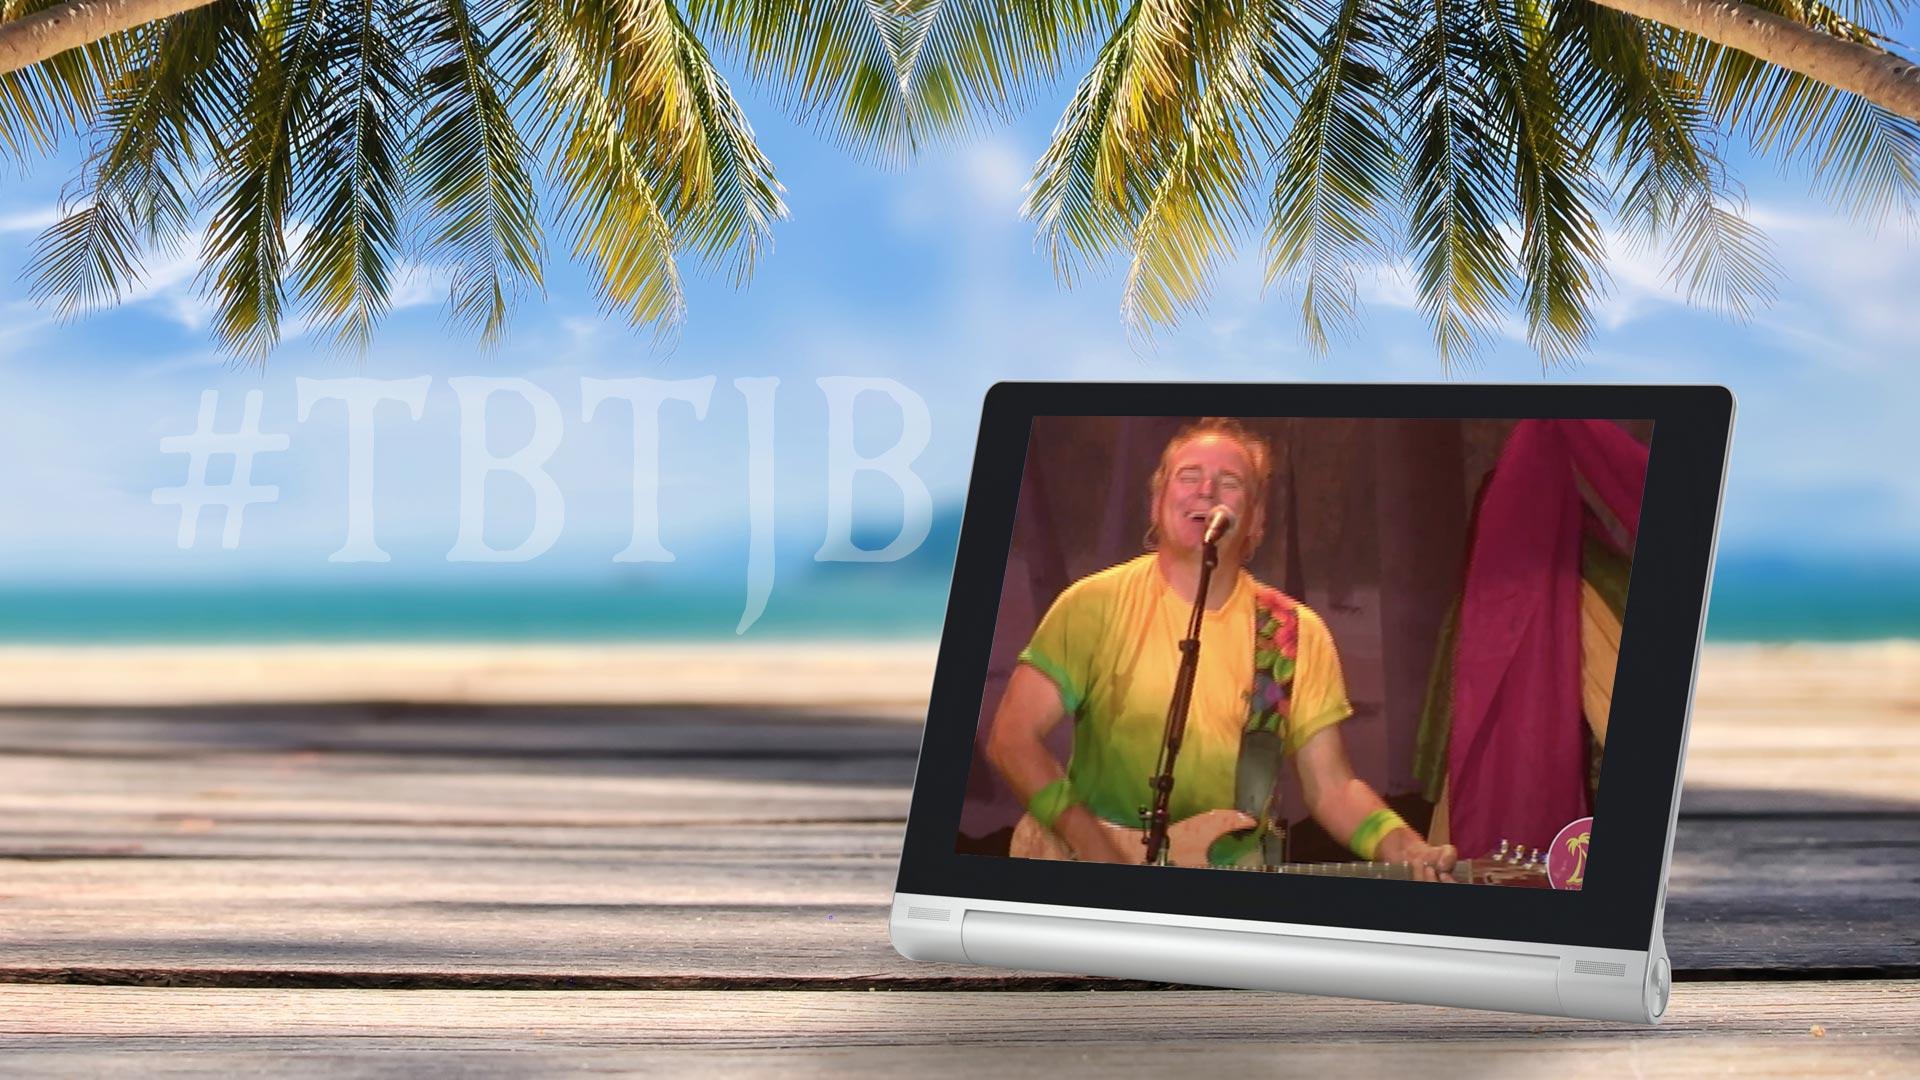 #TBTJB: Jamaica Mistaica Live from Dallas, TX (1998)